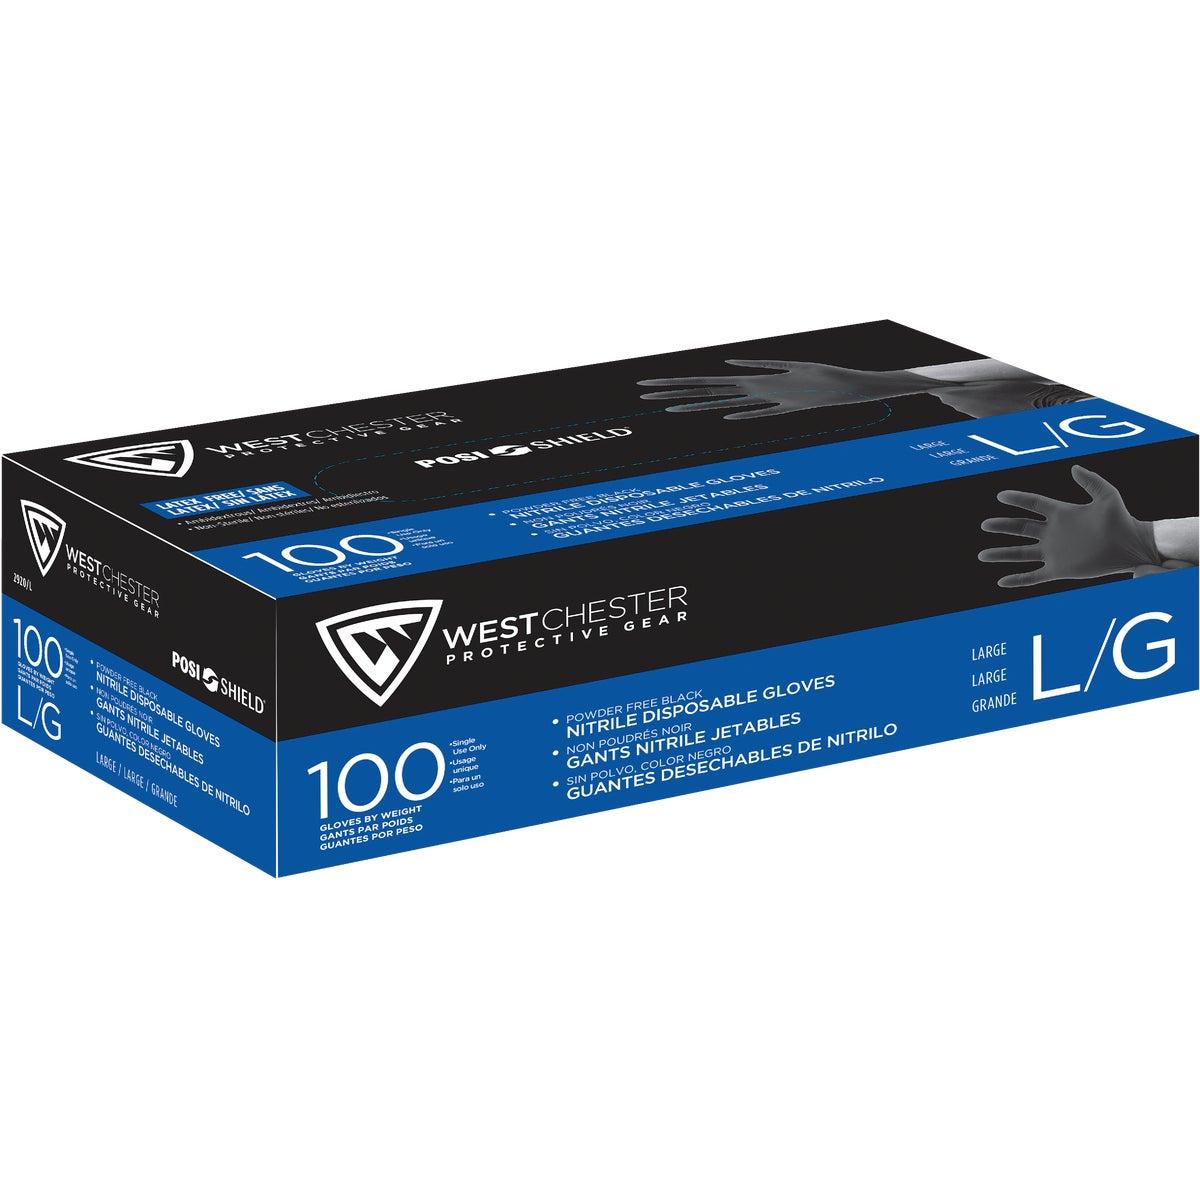 LG BLACK NITRILE GLOVES - 2920/L by West Chester Incom